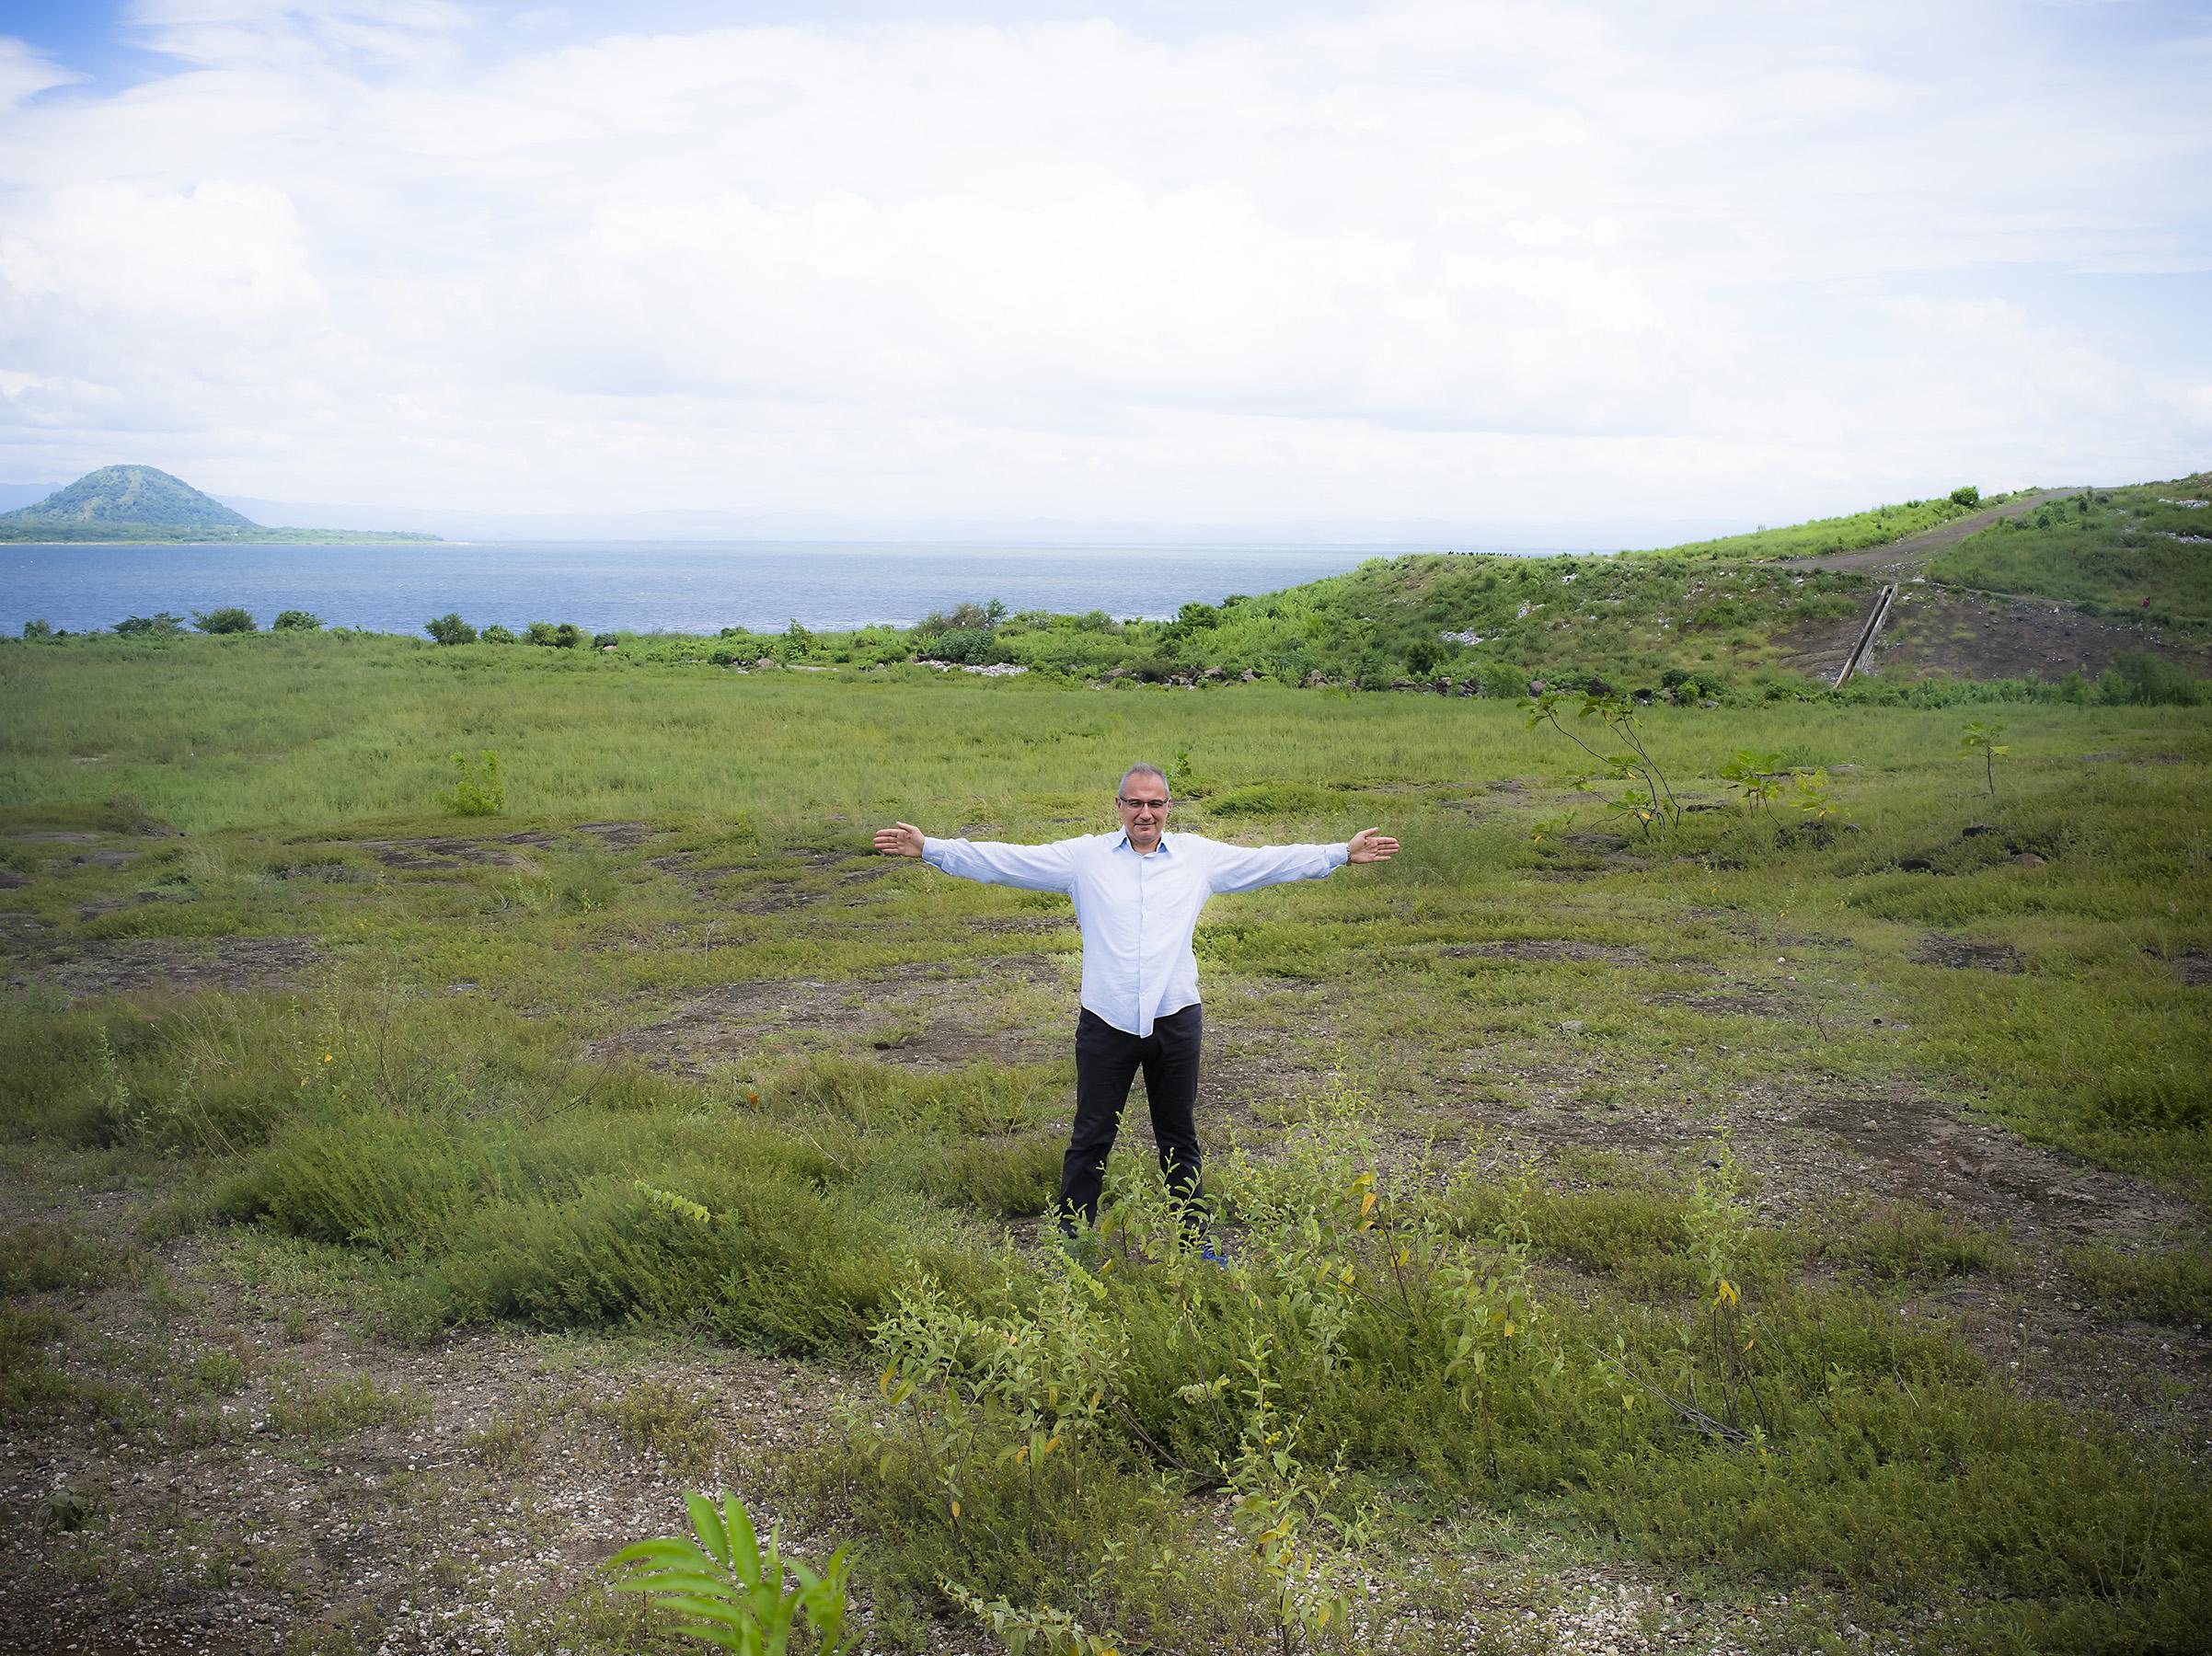 Antonis showing La Chureca and Lake Managua.